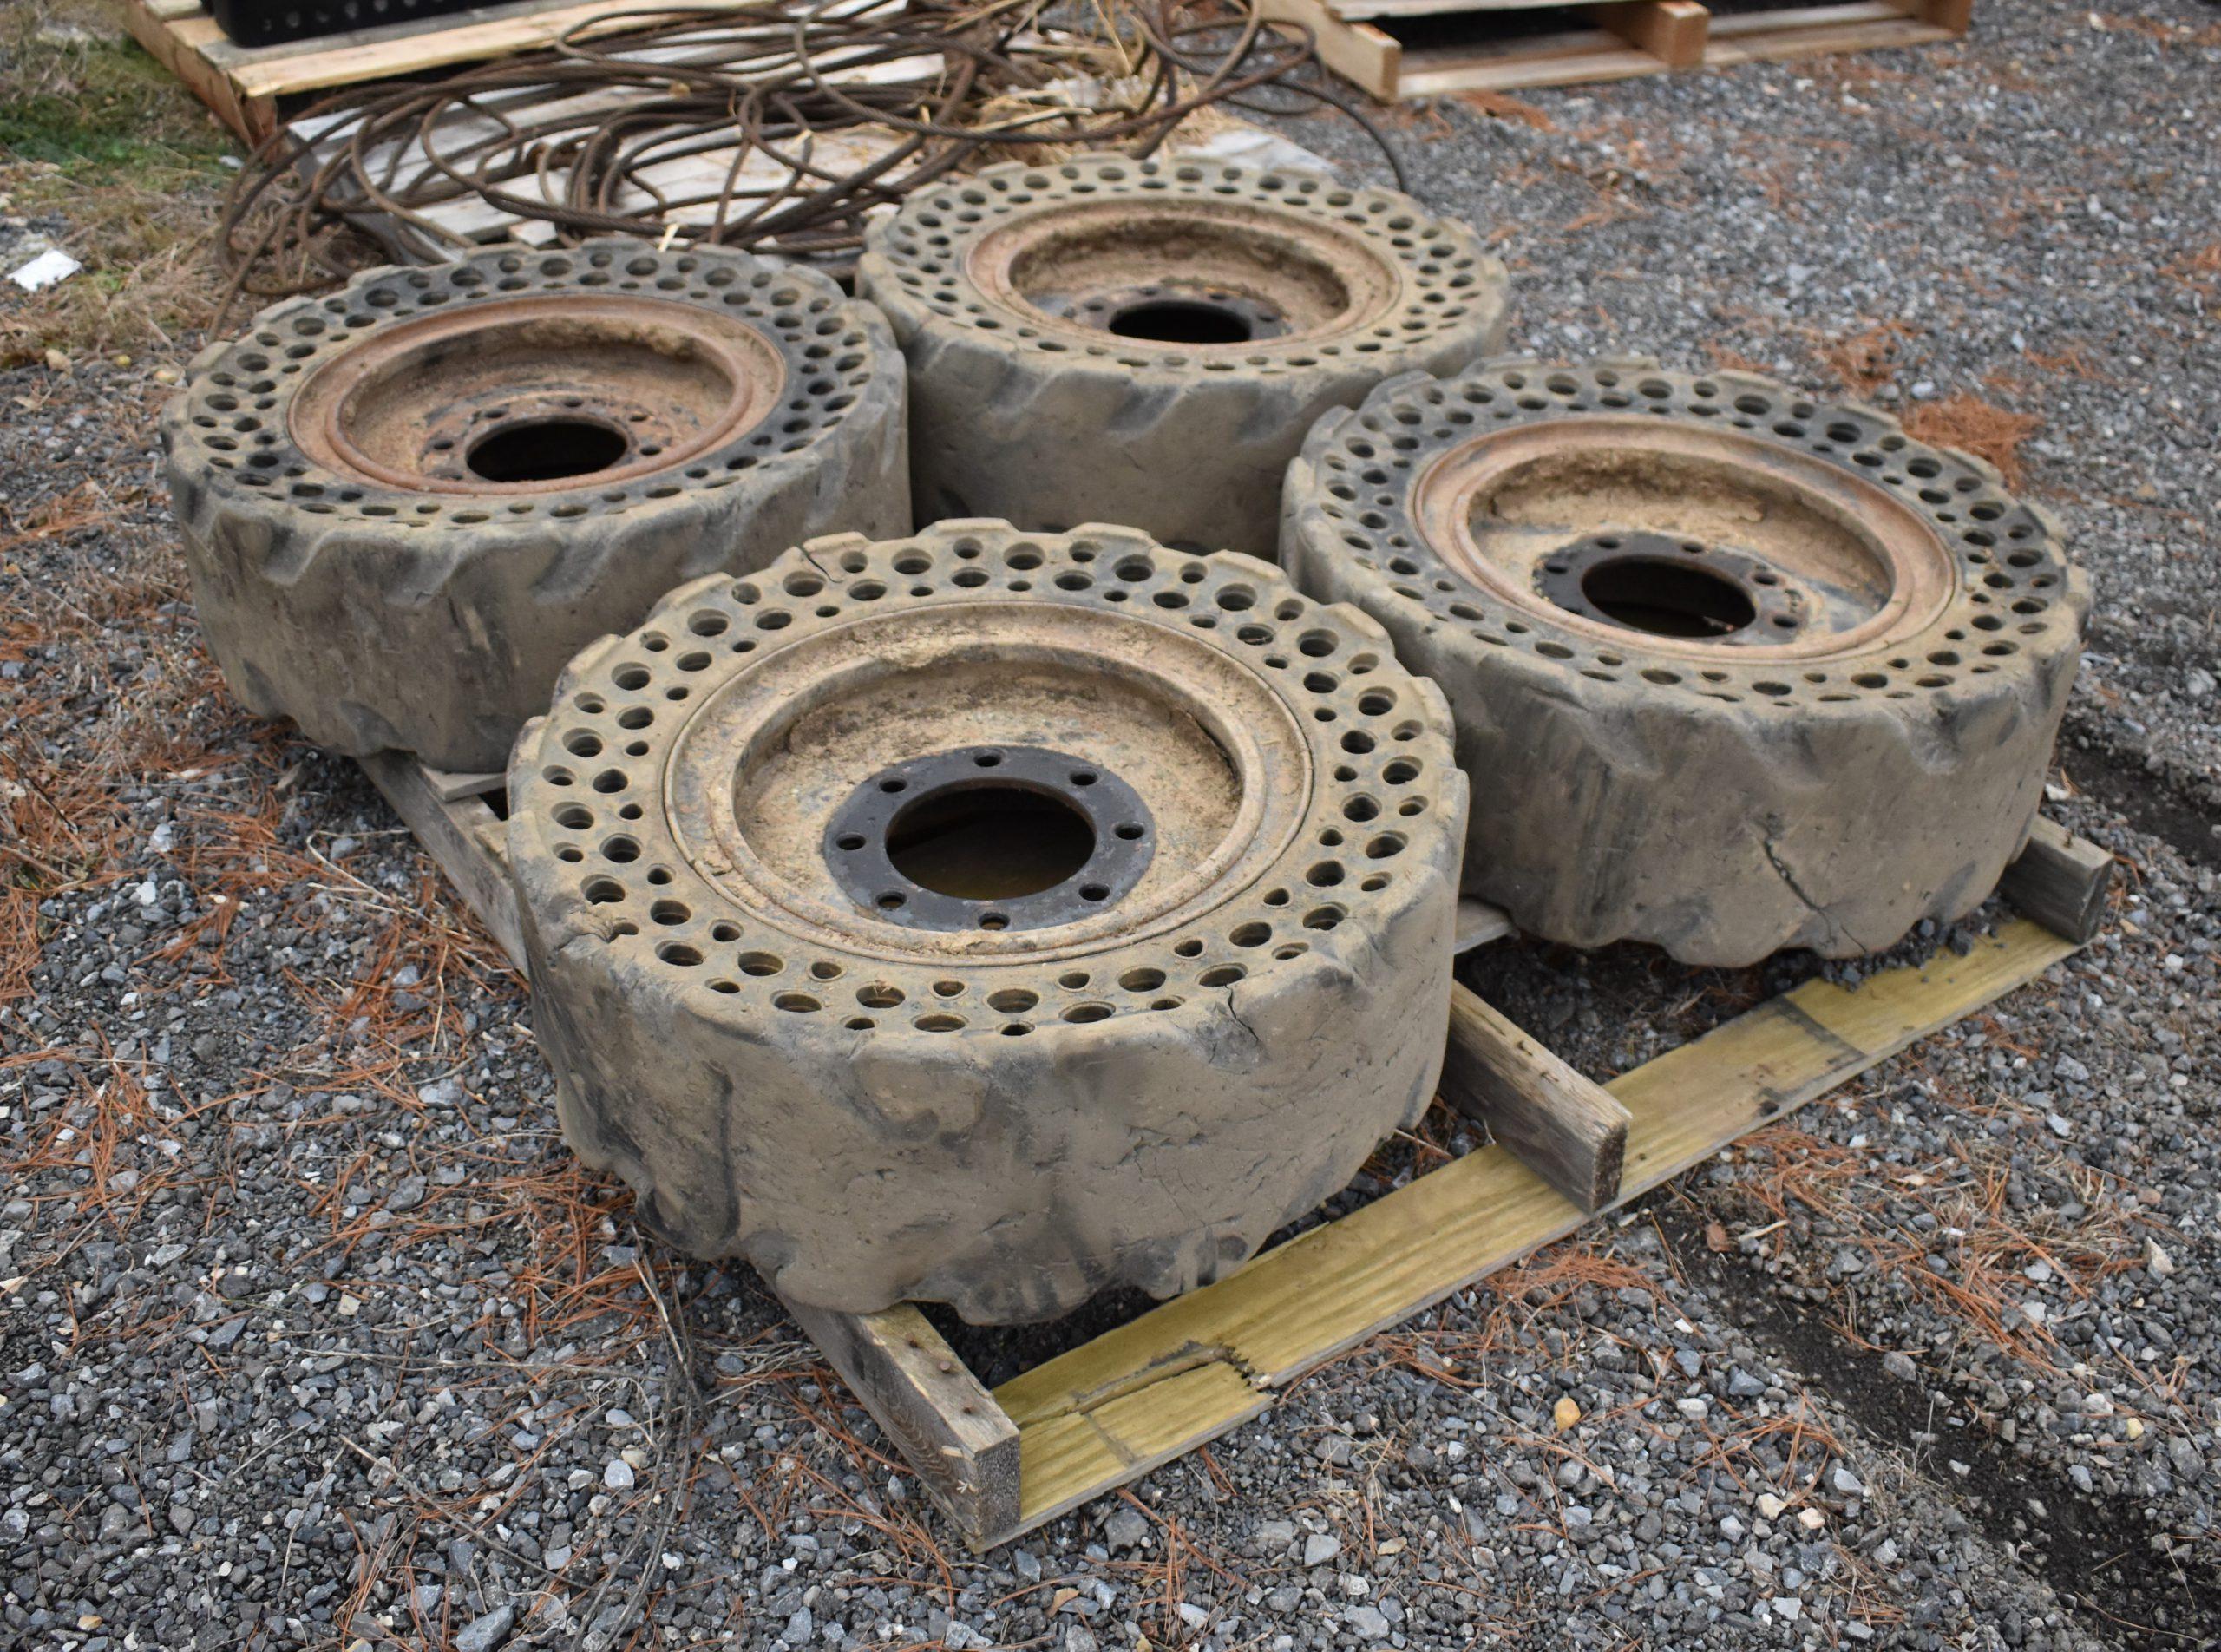 Solid Skid Steer Tires Image